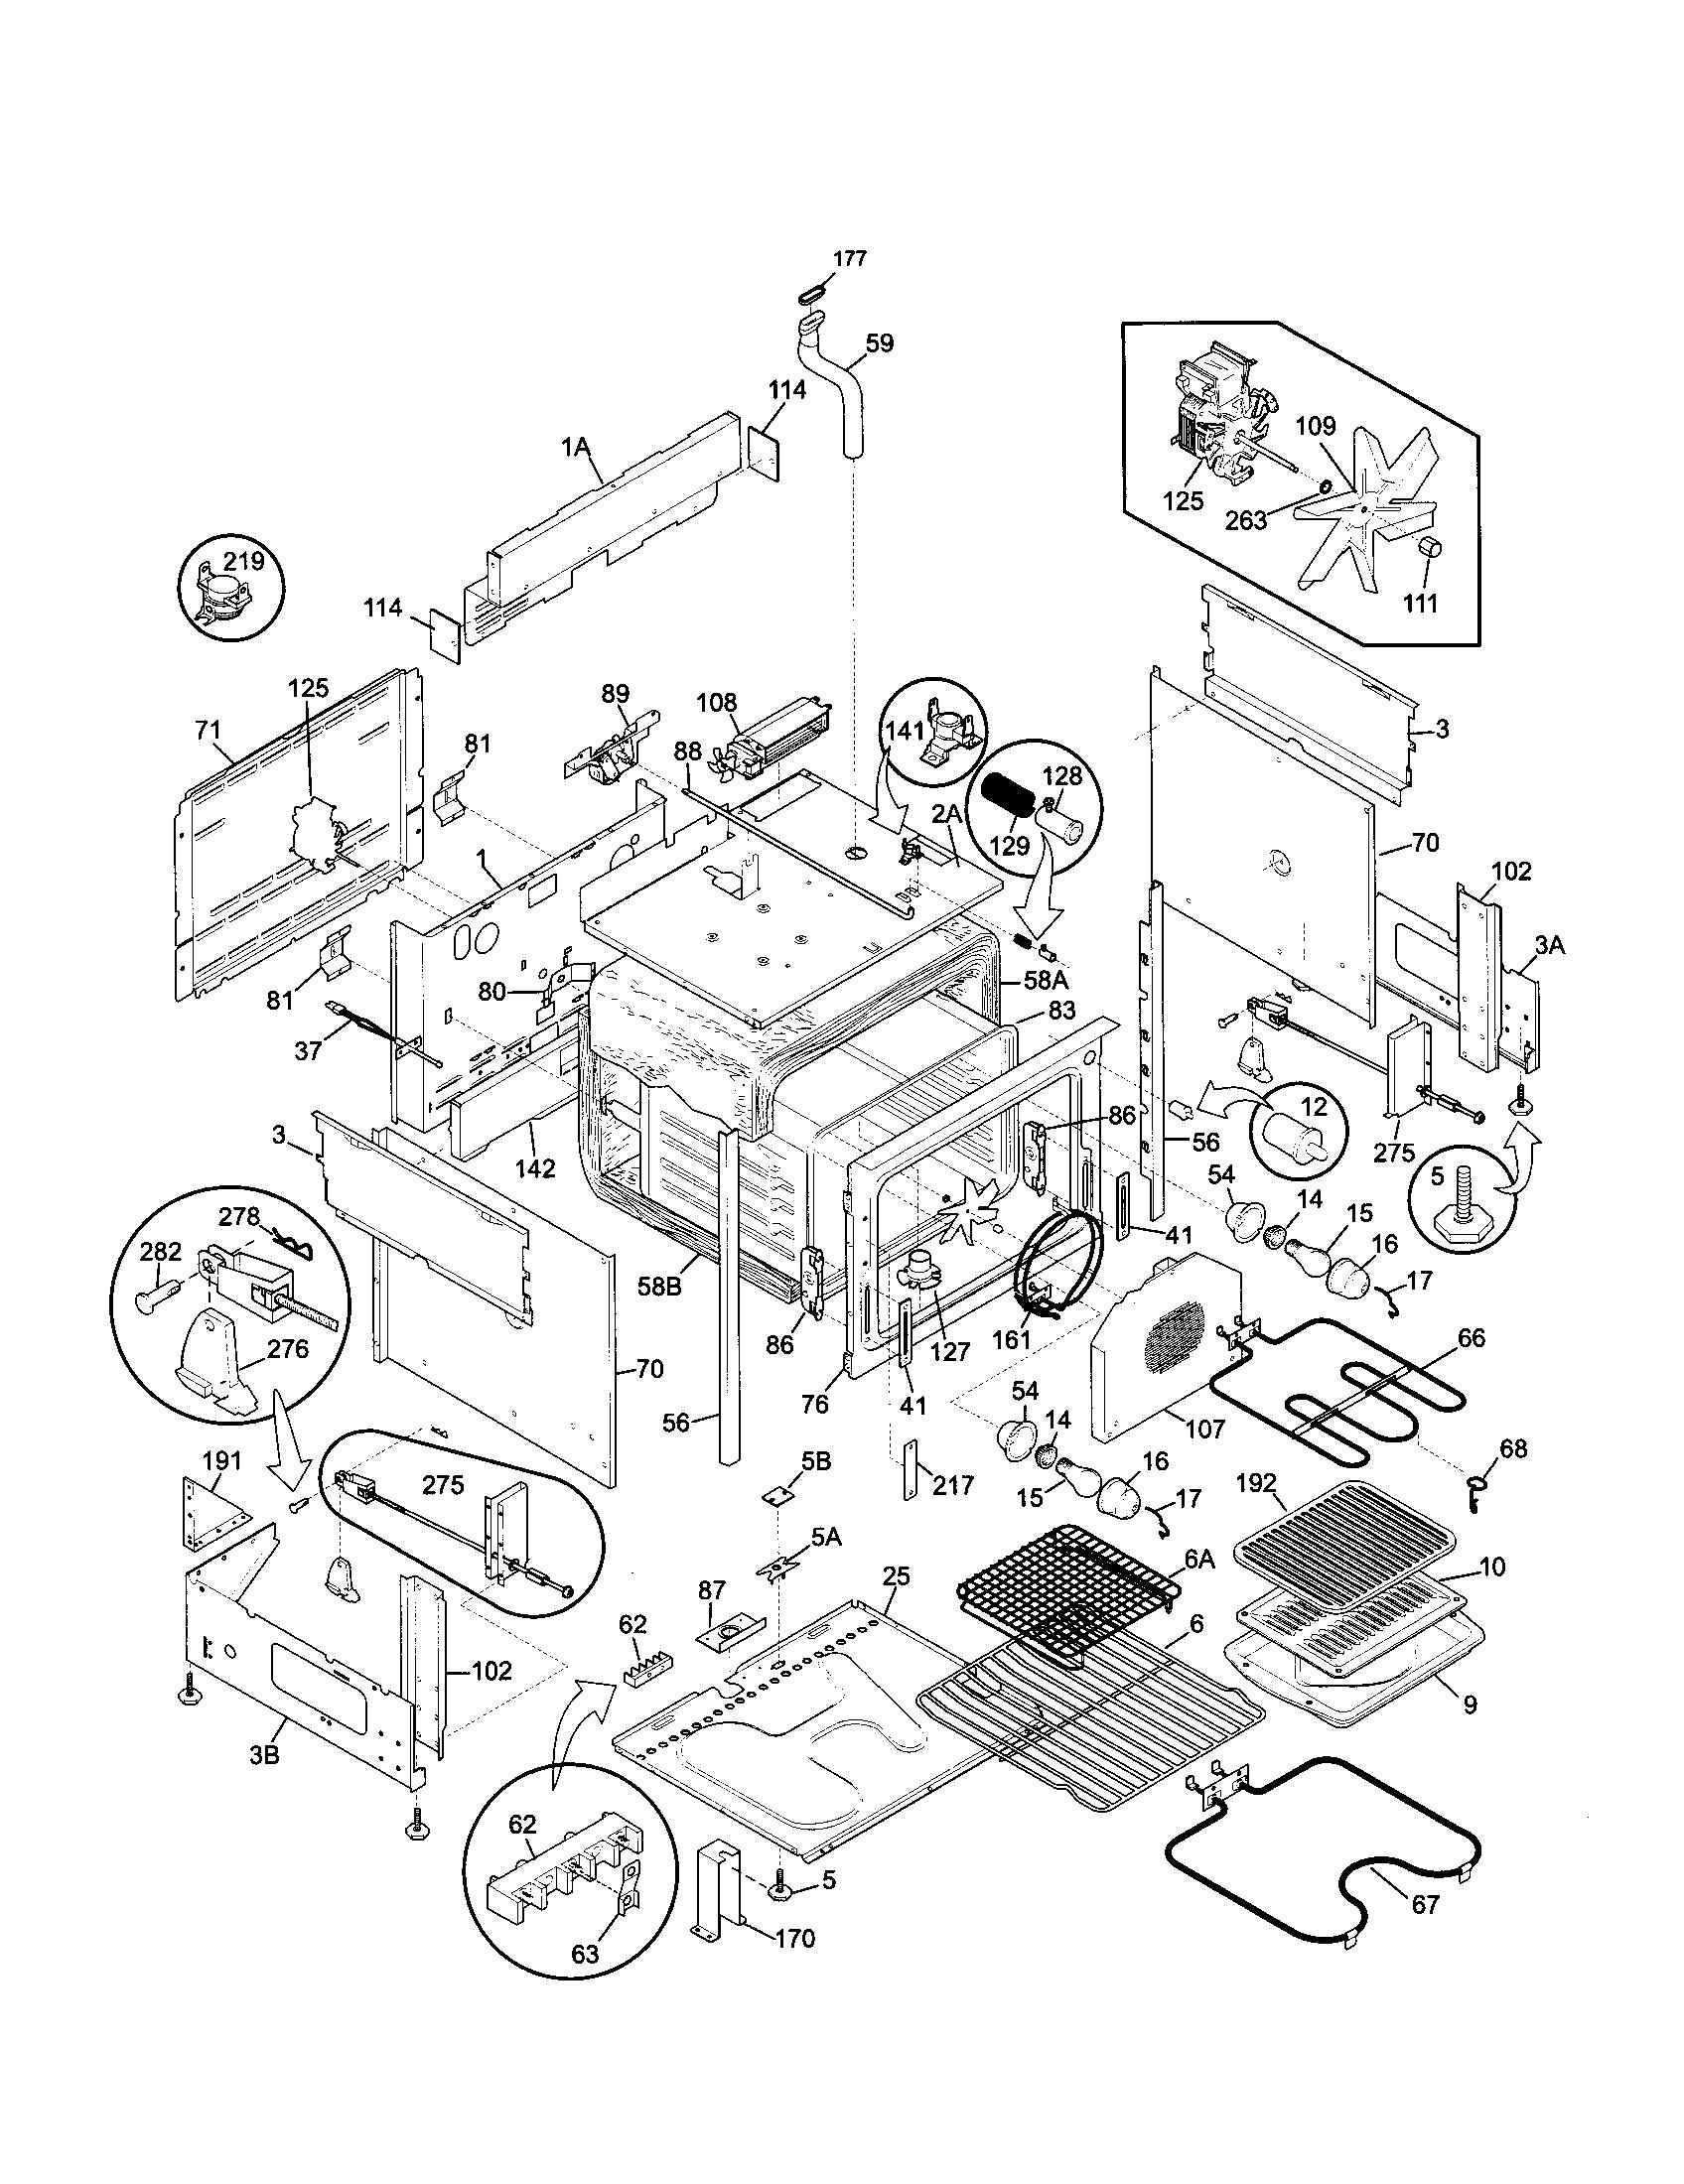 kenmore elite parts diagram ford 300 inline 6 wiring 79046803991 electric slide in range timer